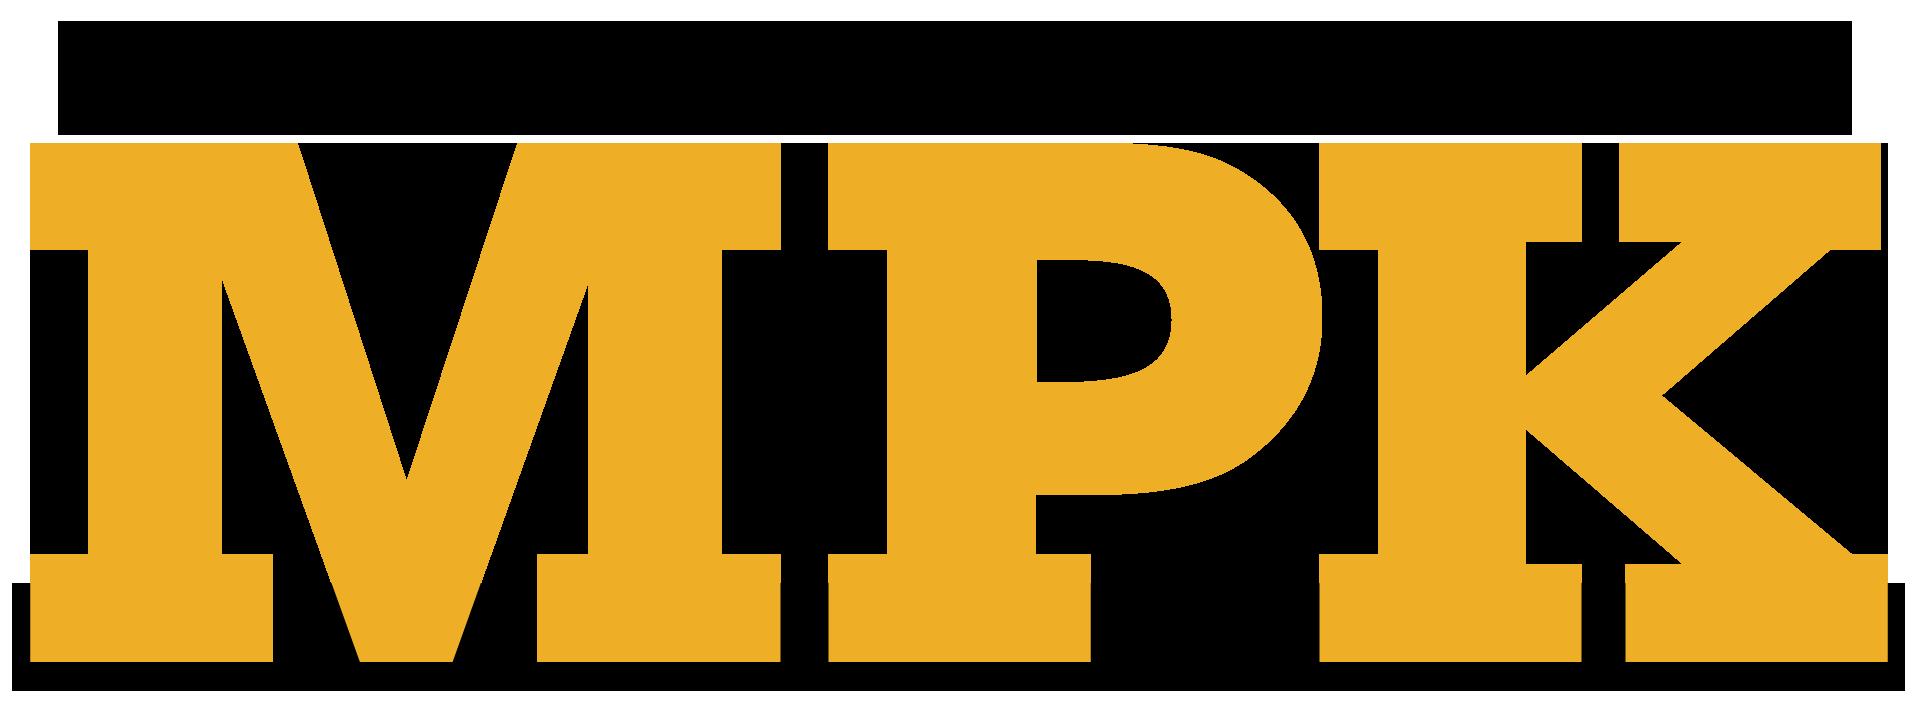 TKP-MPK OY